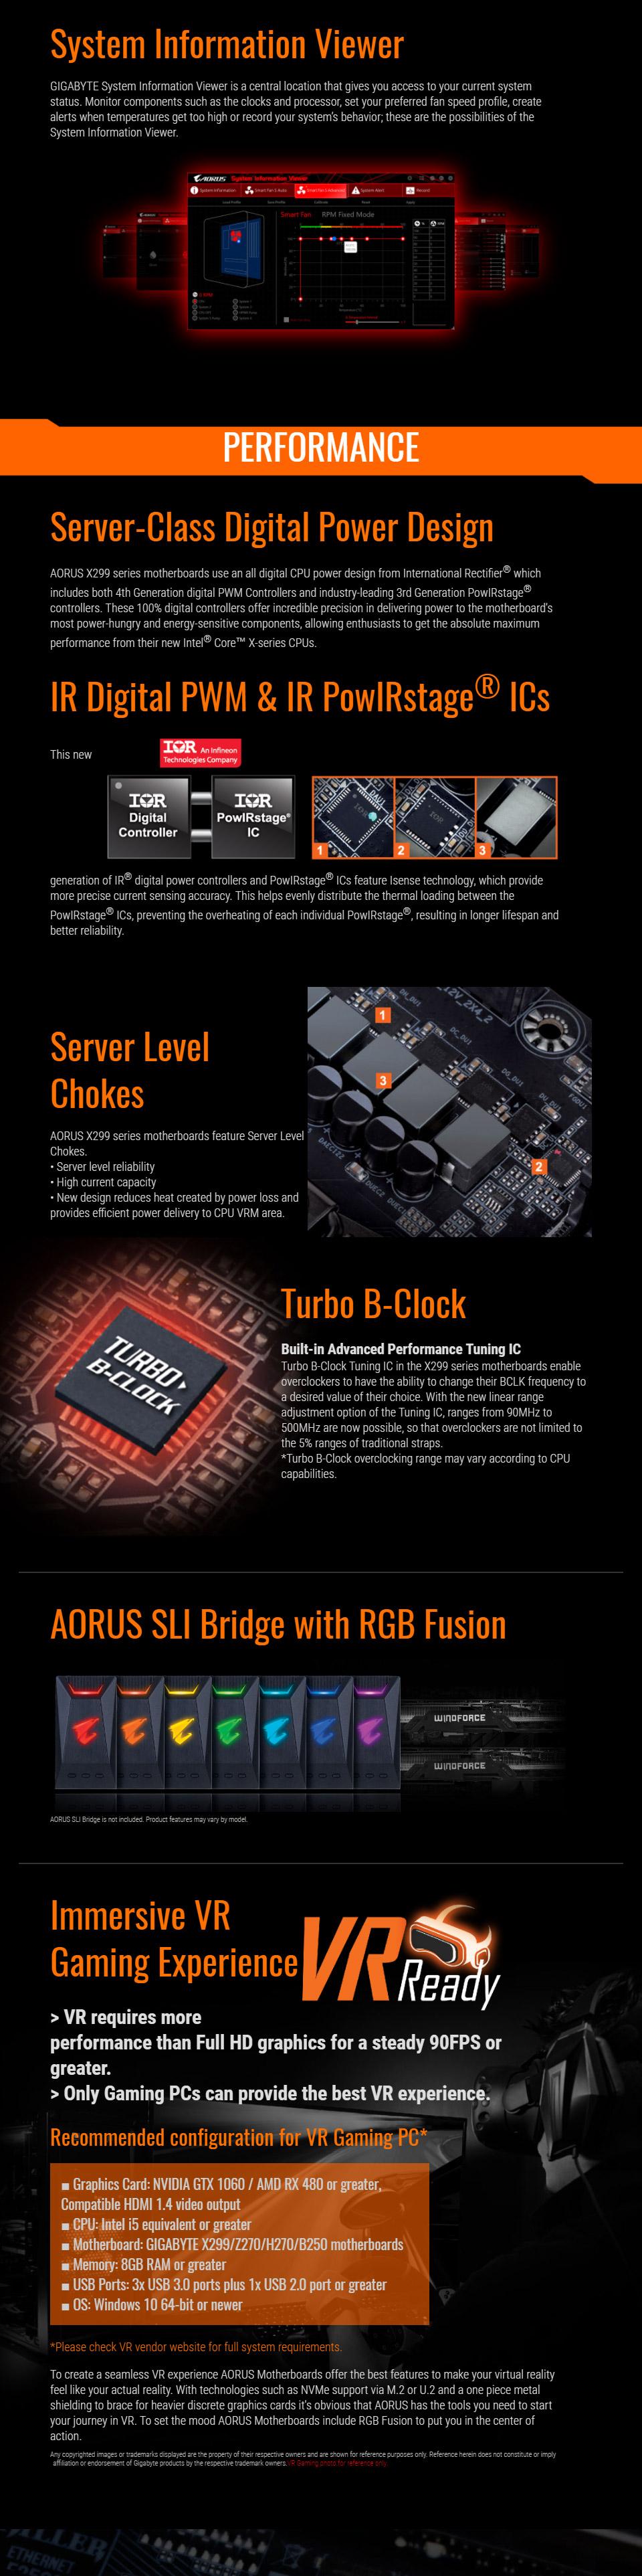 Gigabyte X299 AORUS Gaming 3 Motherboard [GN-X299-AORUS